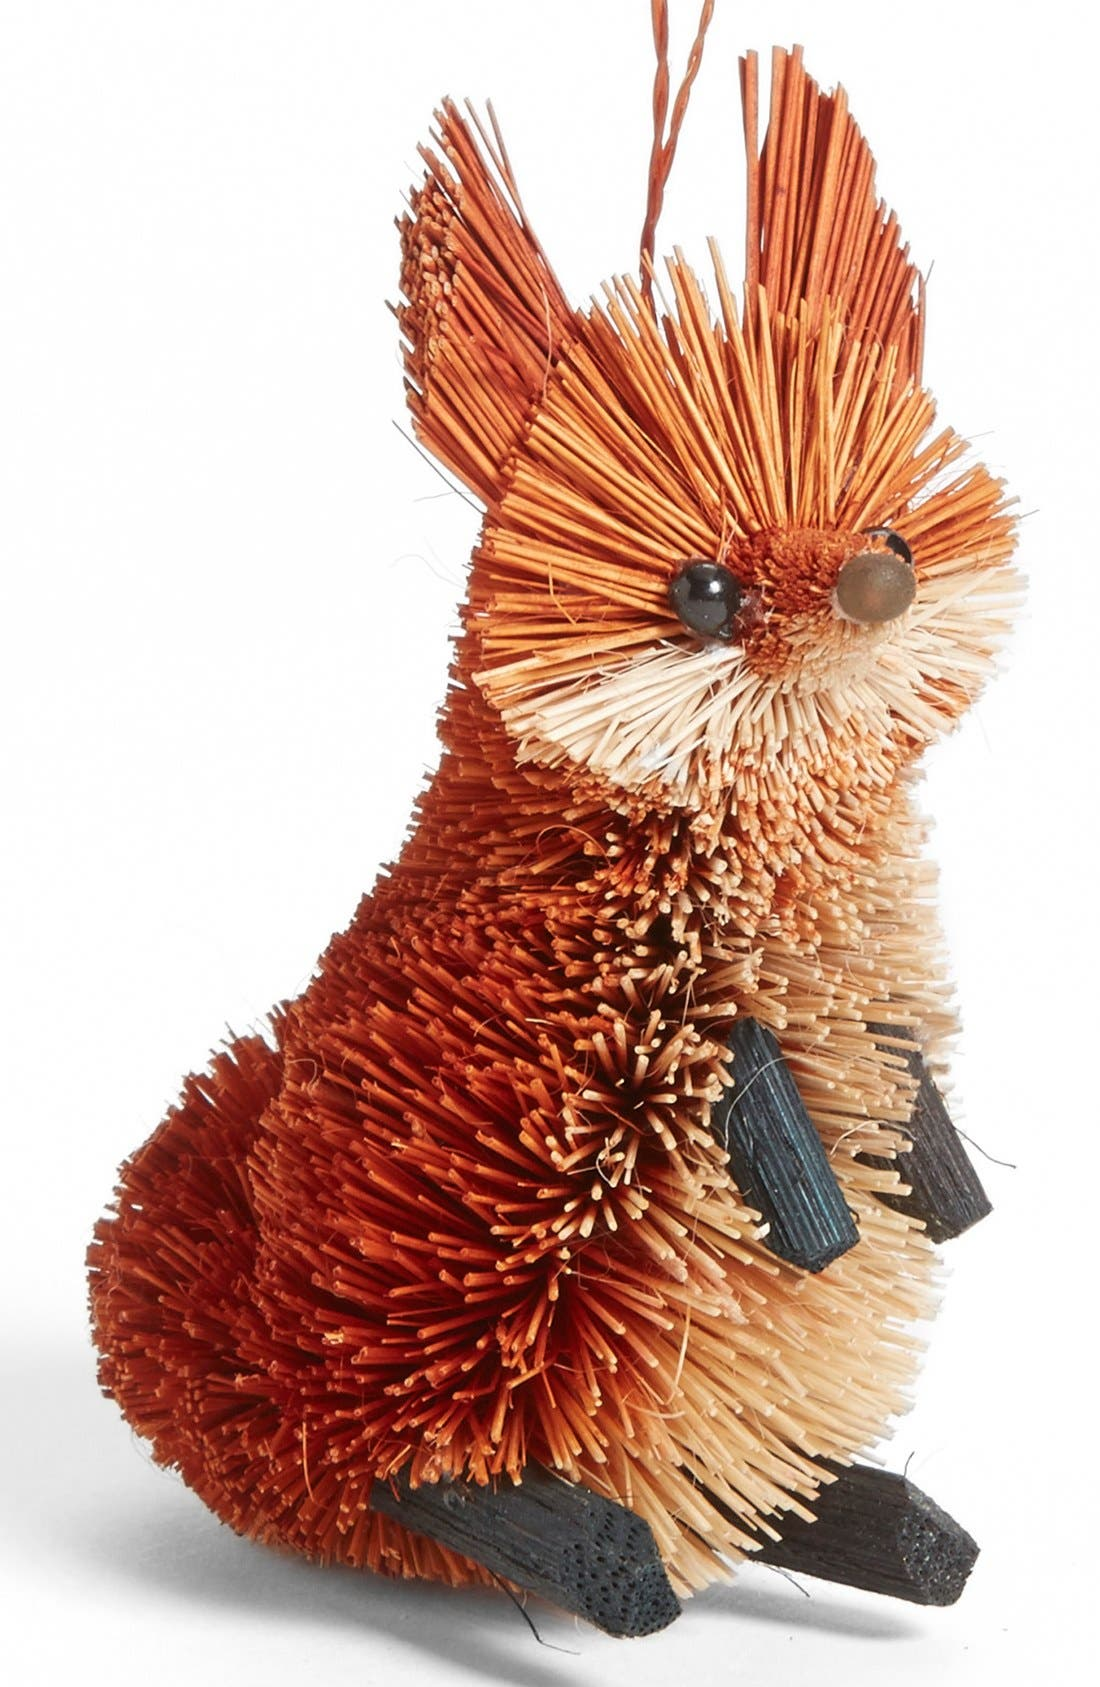 Main Image - Asmyca Fox Ornament